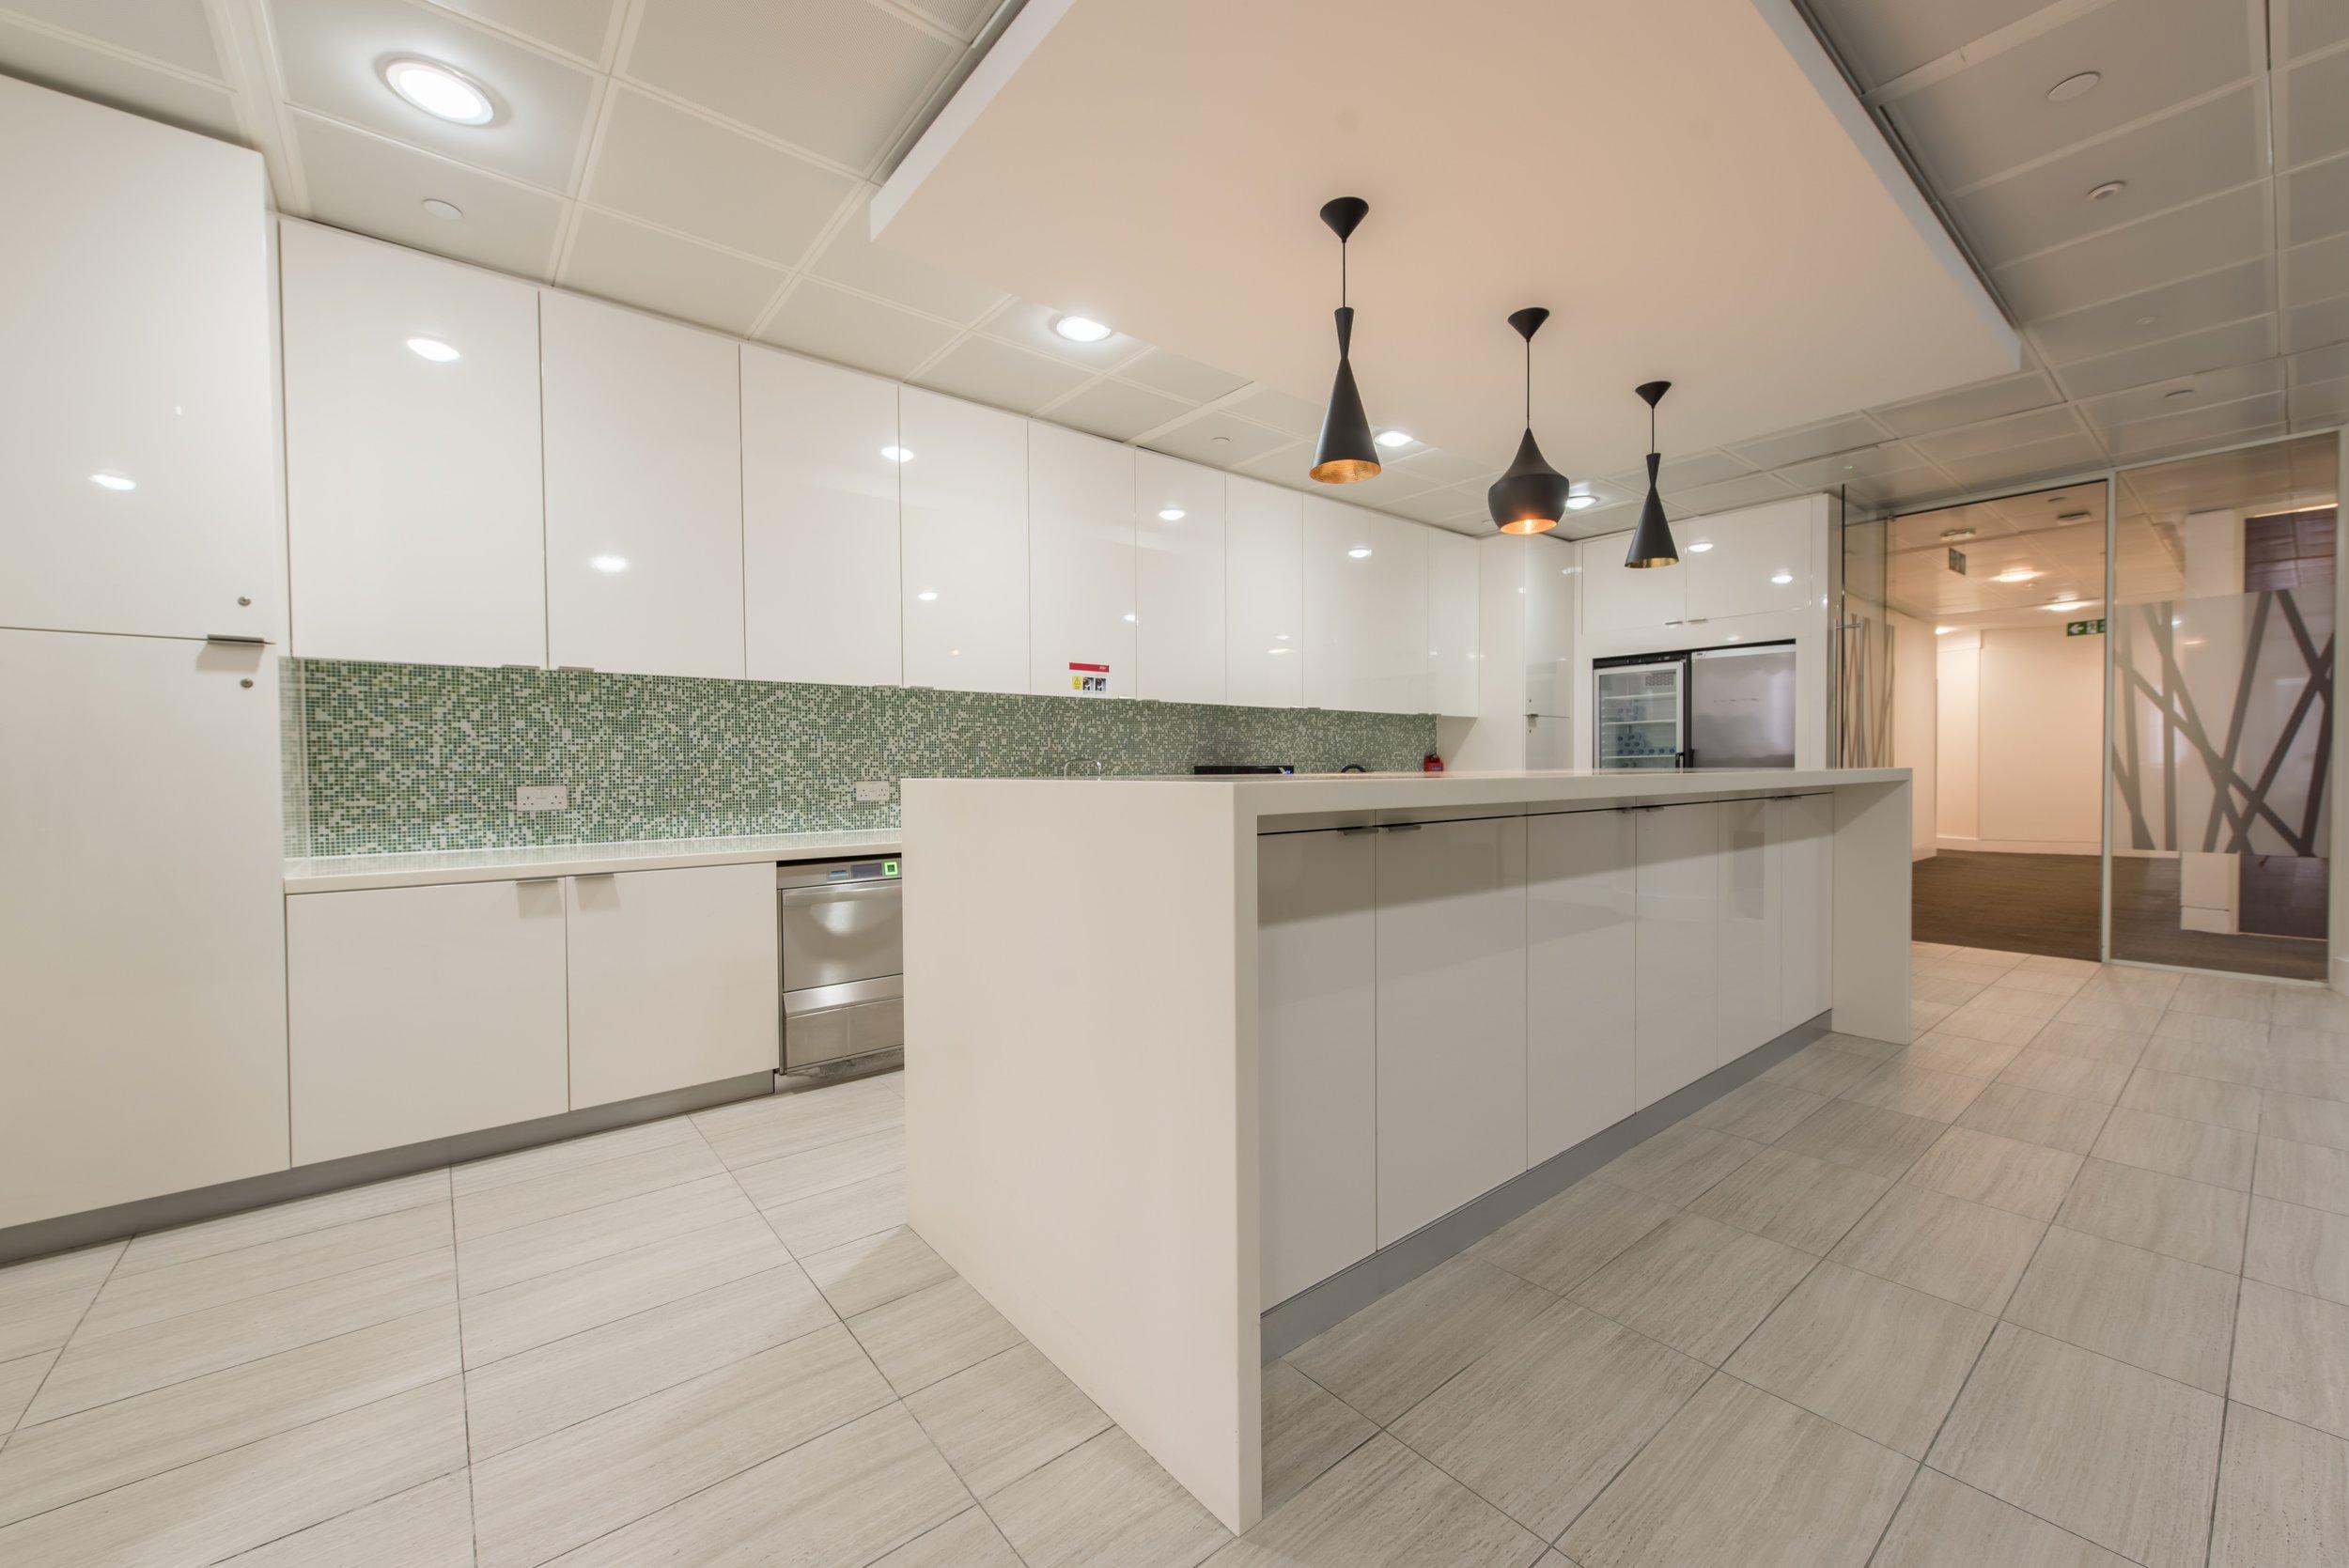 BG_H_BrunelEstates_LansdownHouse_Kitchen_171012_002.jpg